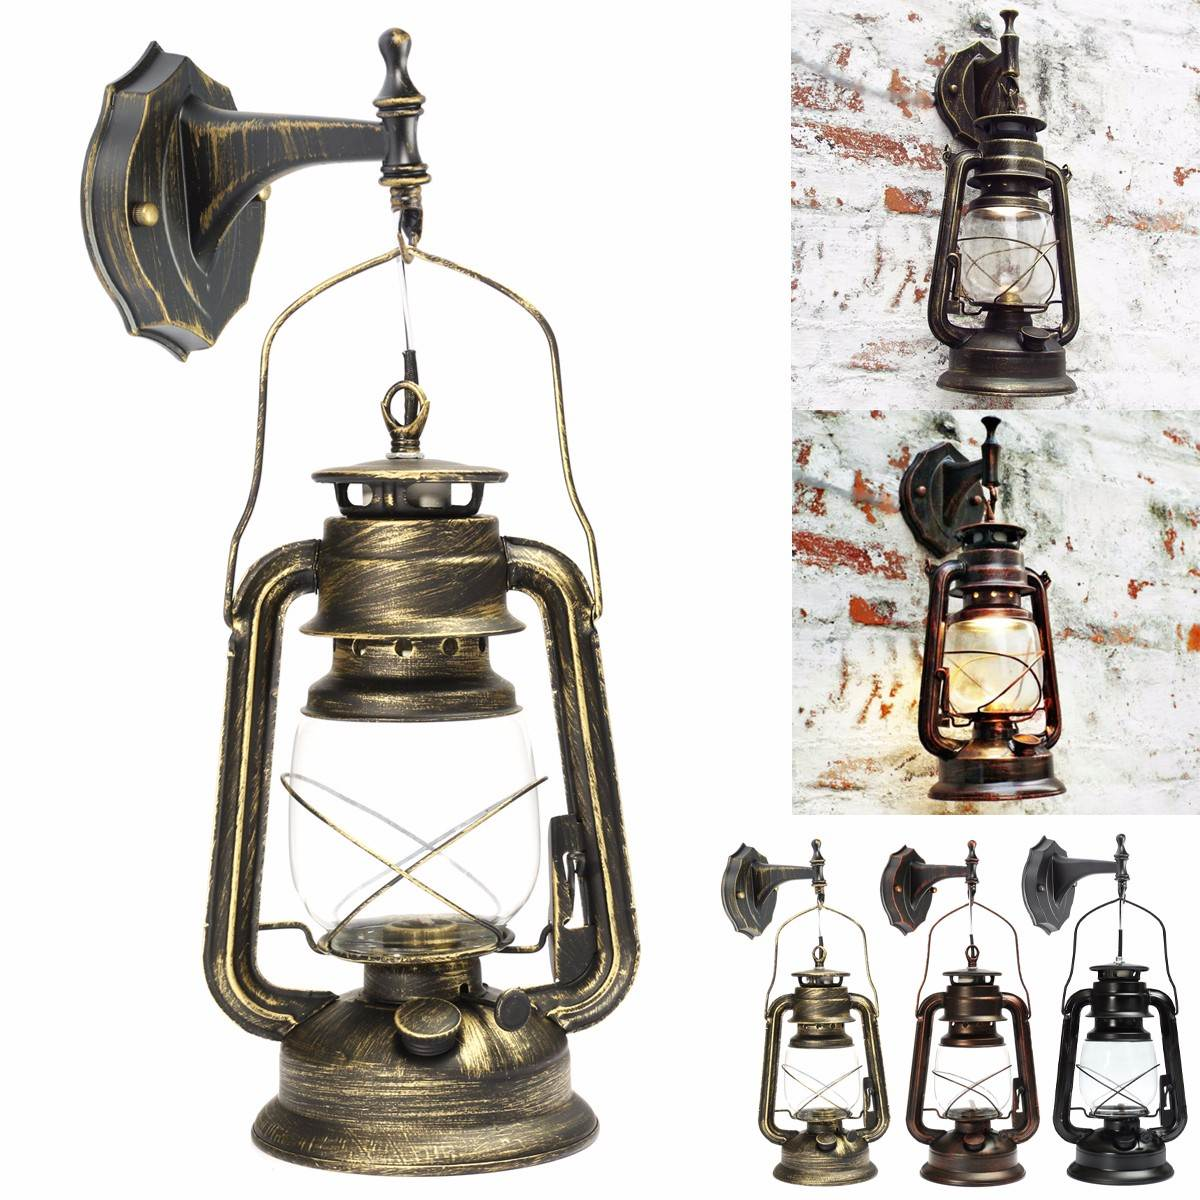 Retro Lantern European Kerosene Wall Lamp Bedroom Wall Sconce Wrought Iron Glass Restaurant Bar Aisle Light Fixture With Bulb